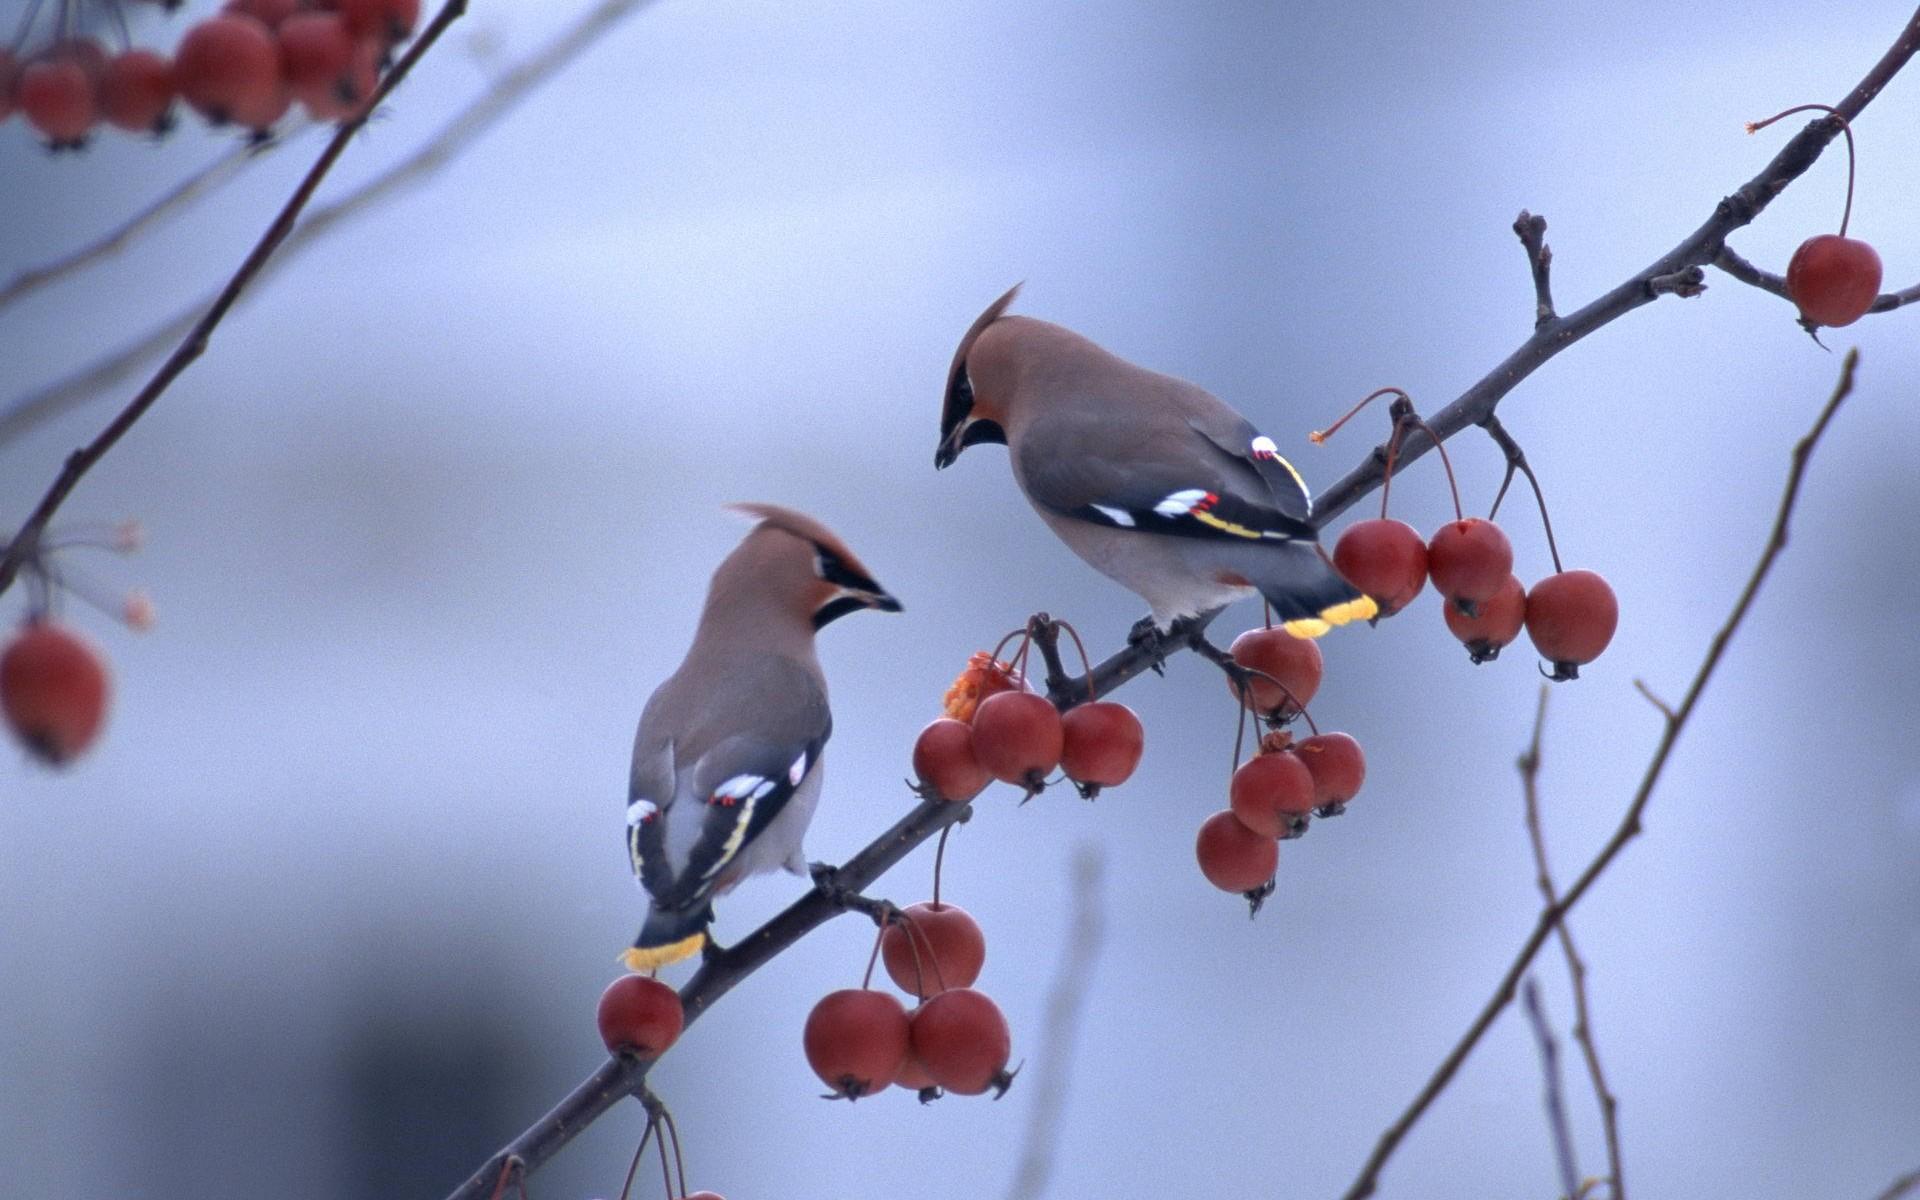 Bird branch close up birds branches berries wallpaper 1920x1200 1920x1200